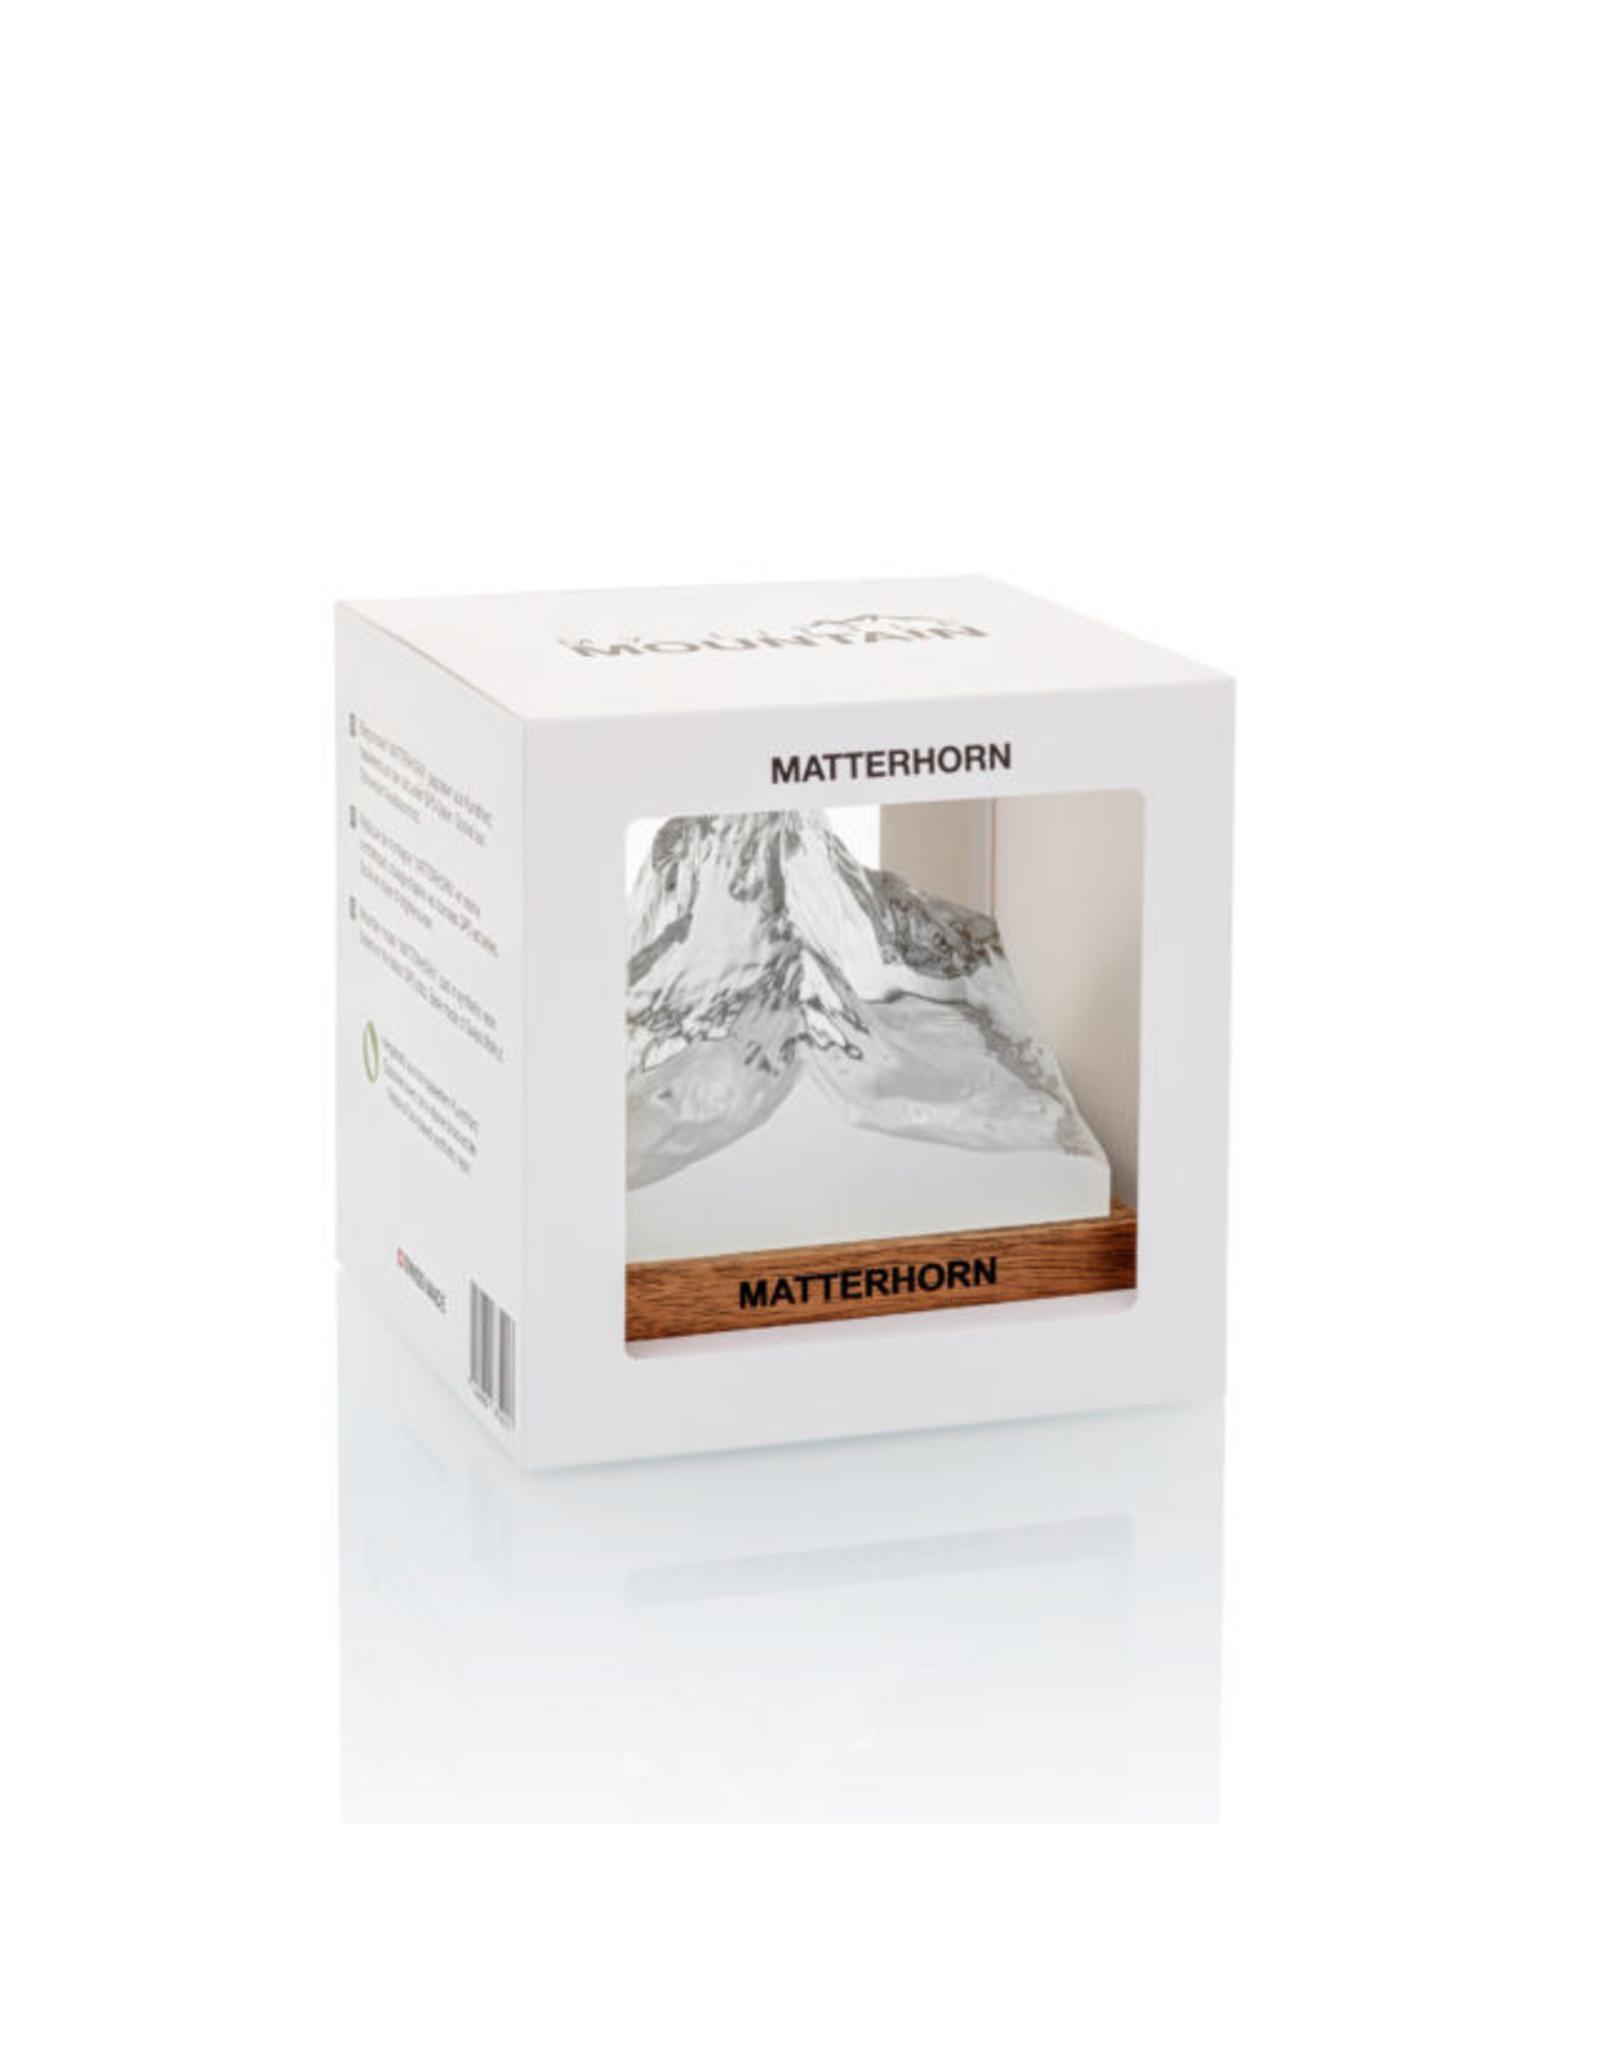 My Little Mountain Bergmodell Matterhorn Nussbaum/Kunstharz